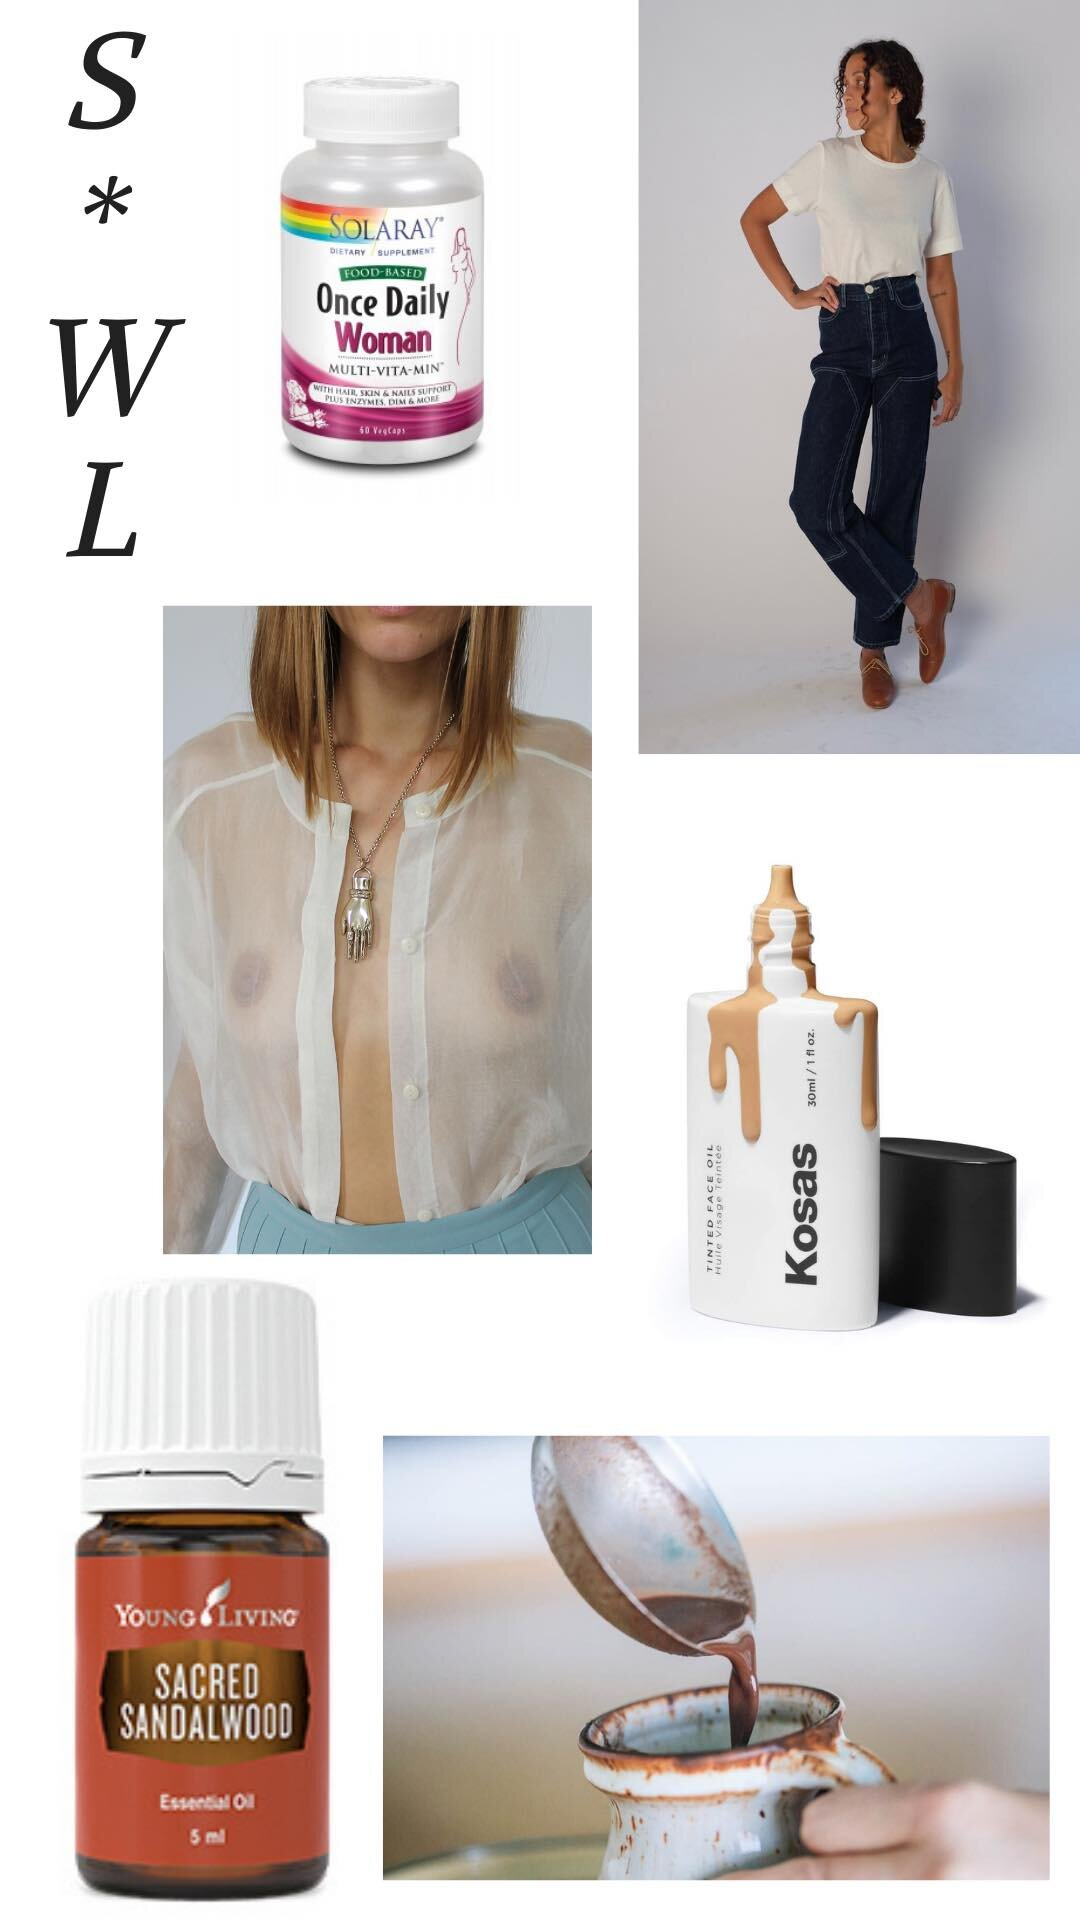 Once Daily Woman | Sacred Sandalwood | Jesse Kamm Pants | Kosas Tinted Face Oil